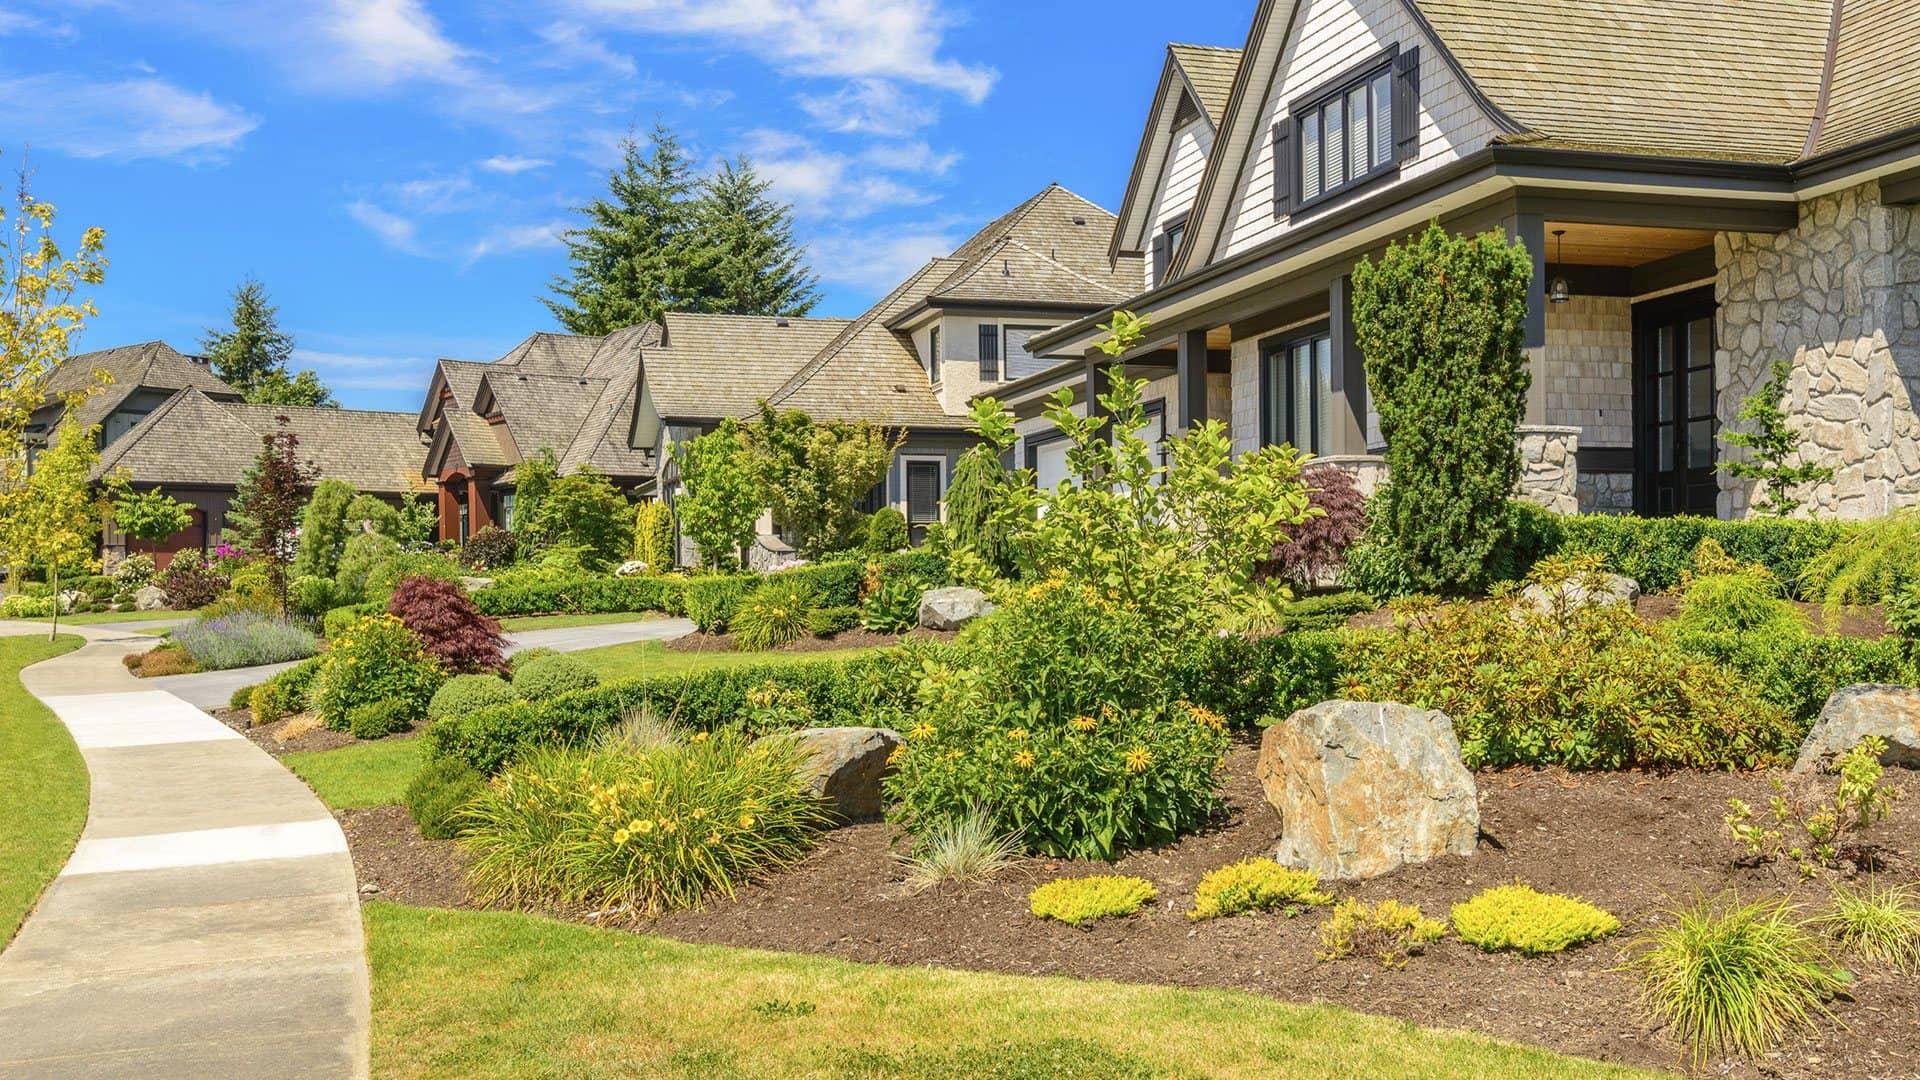 Cherry Oak Landscaping Lawn Care Services, Landscape Design and Landscaping Services slide 2